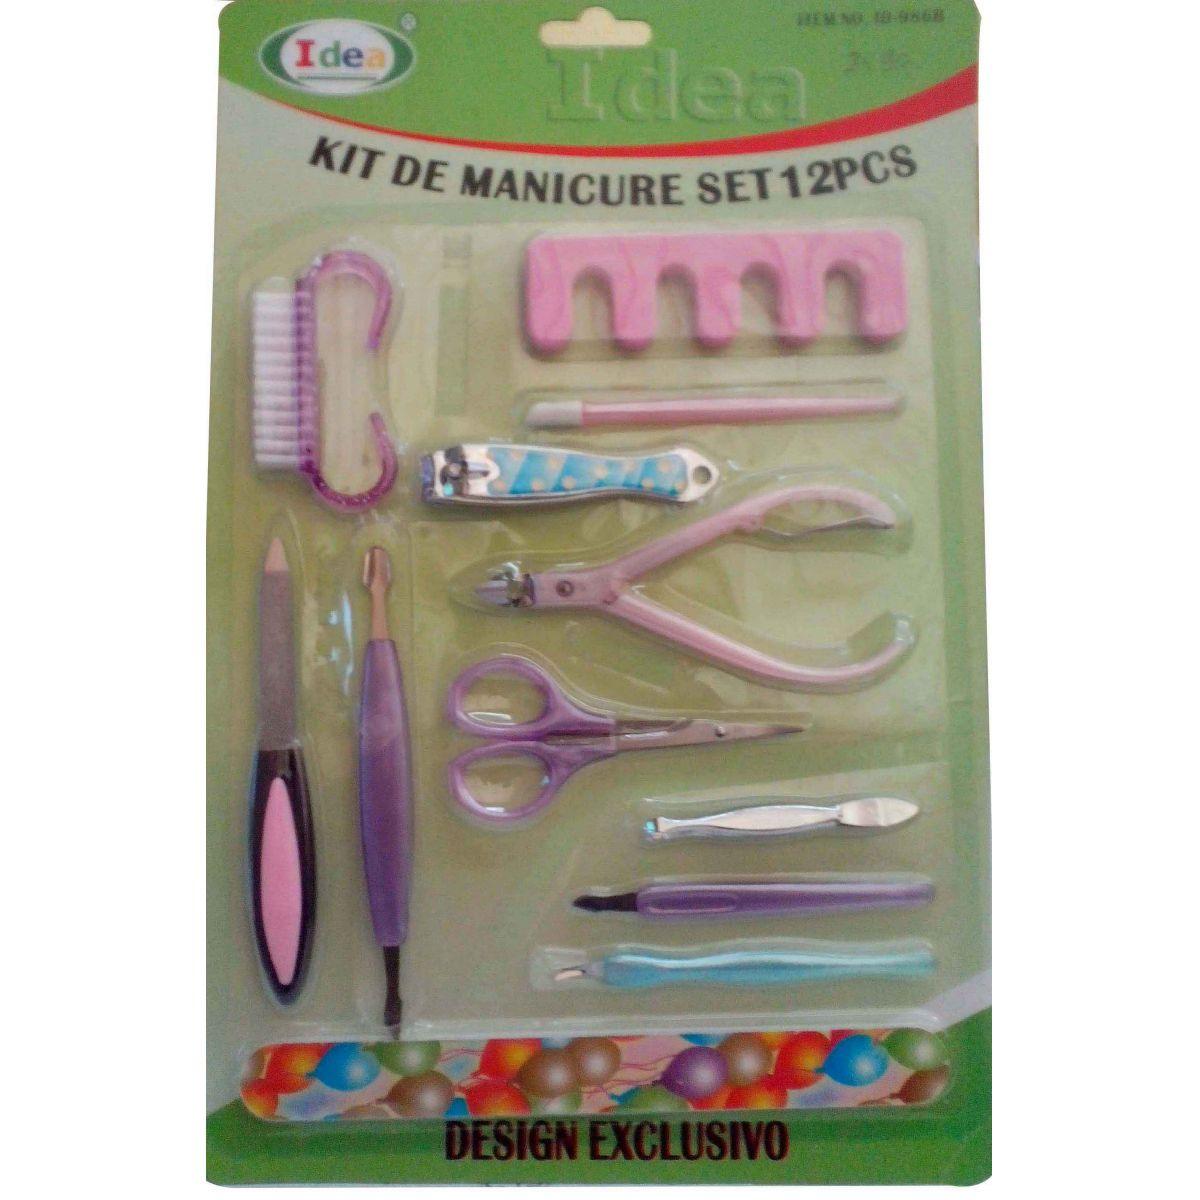 Kit Manicure Set 12 Peças - Frete Grátis